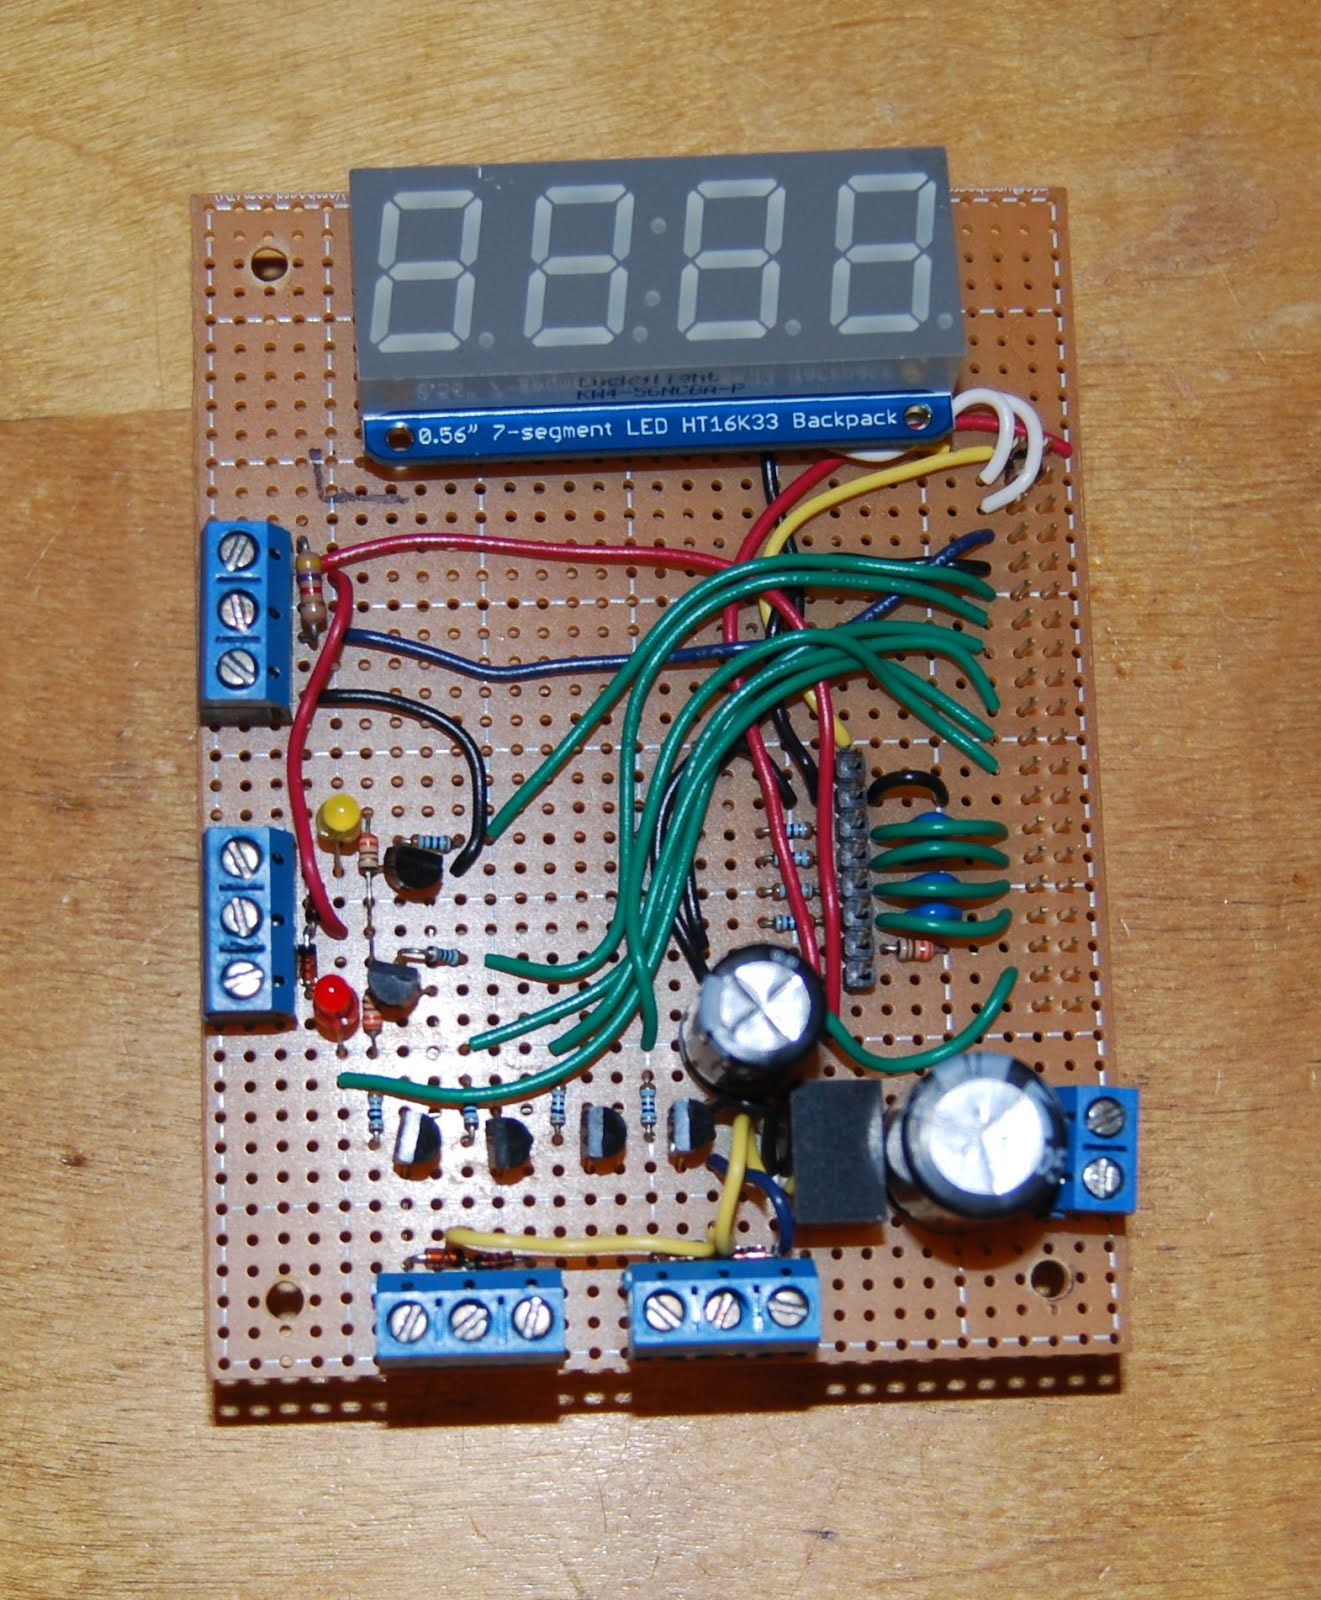 hot tub controller circuit board [ 1321 x 1600 Pixel ]